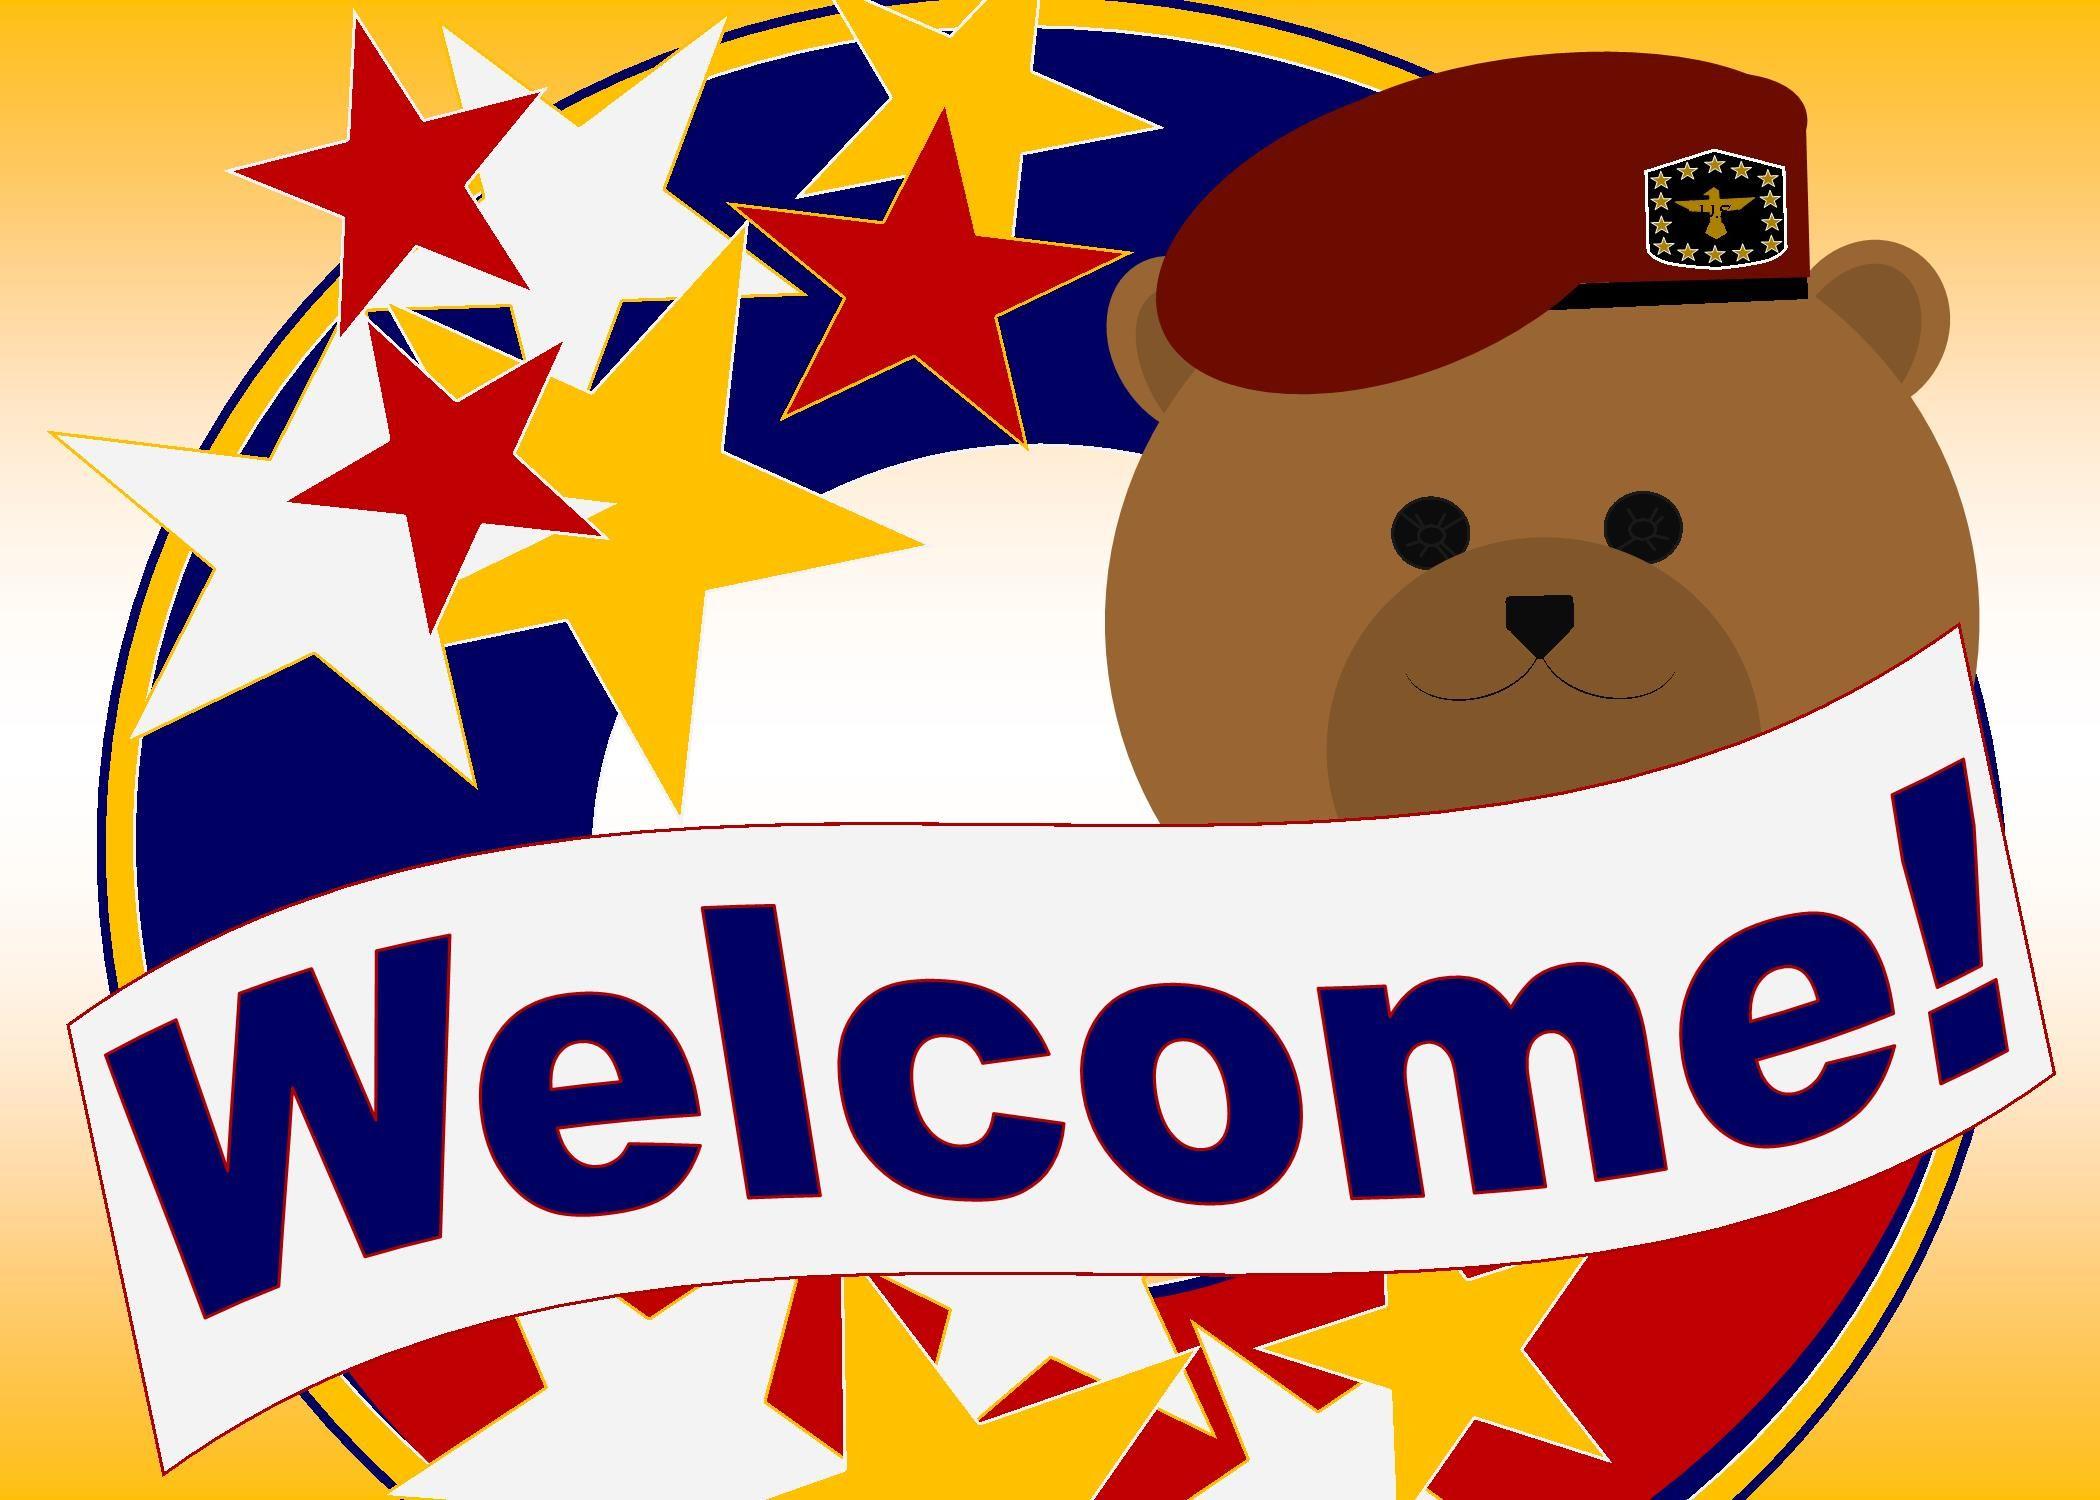 Debut welcome greeting card designs w usn army usaf uscg welcome greeting card designs w usn army usaf uscg usmc kristyandbryce Choice Image